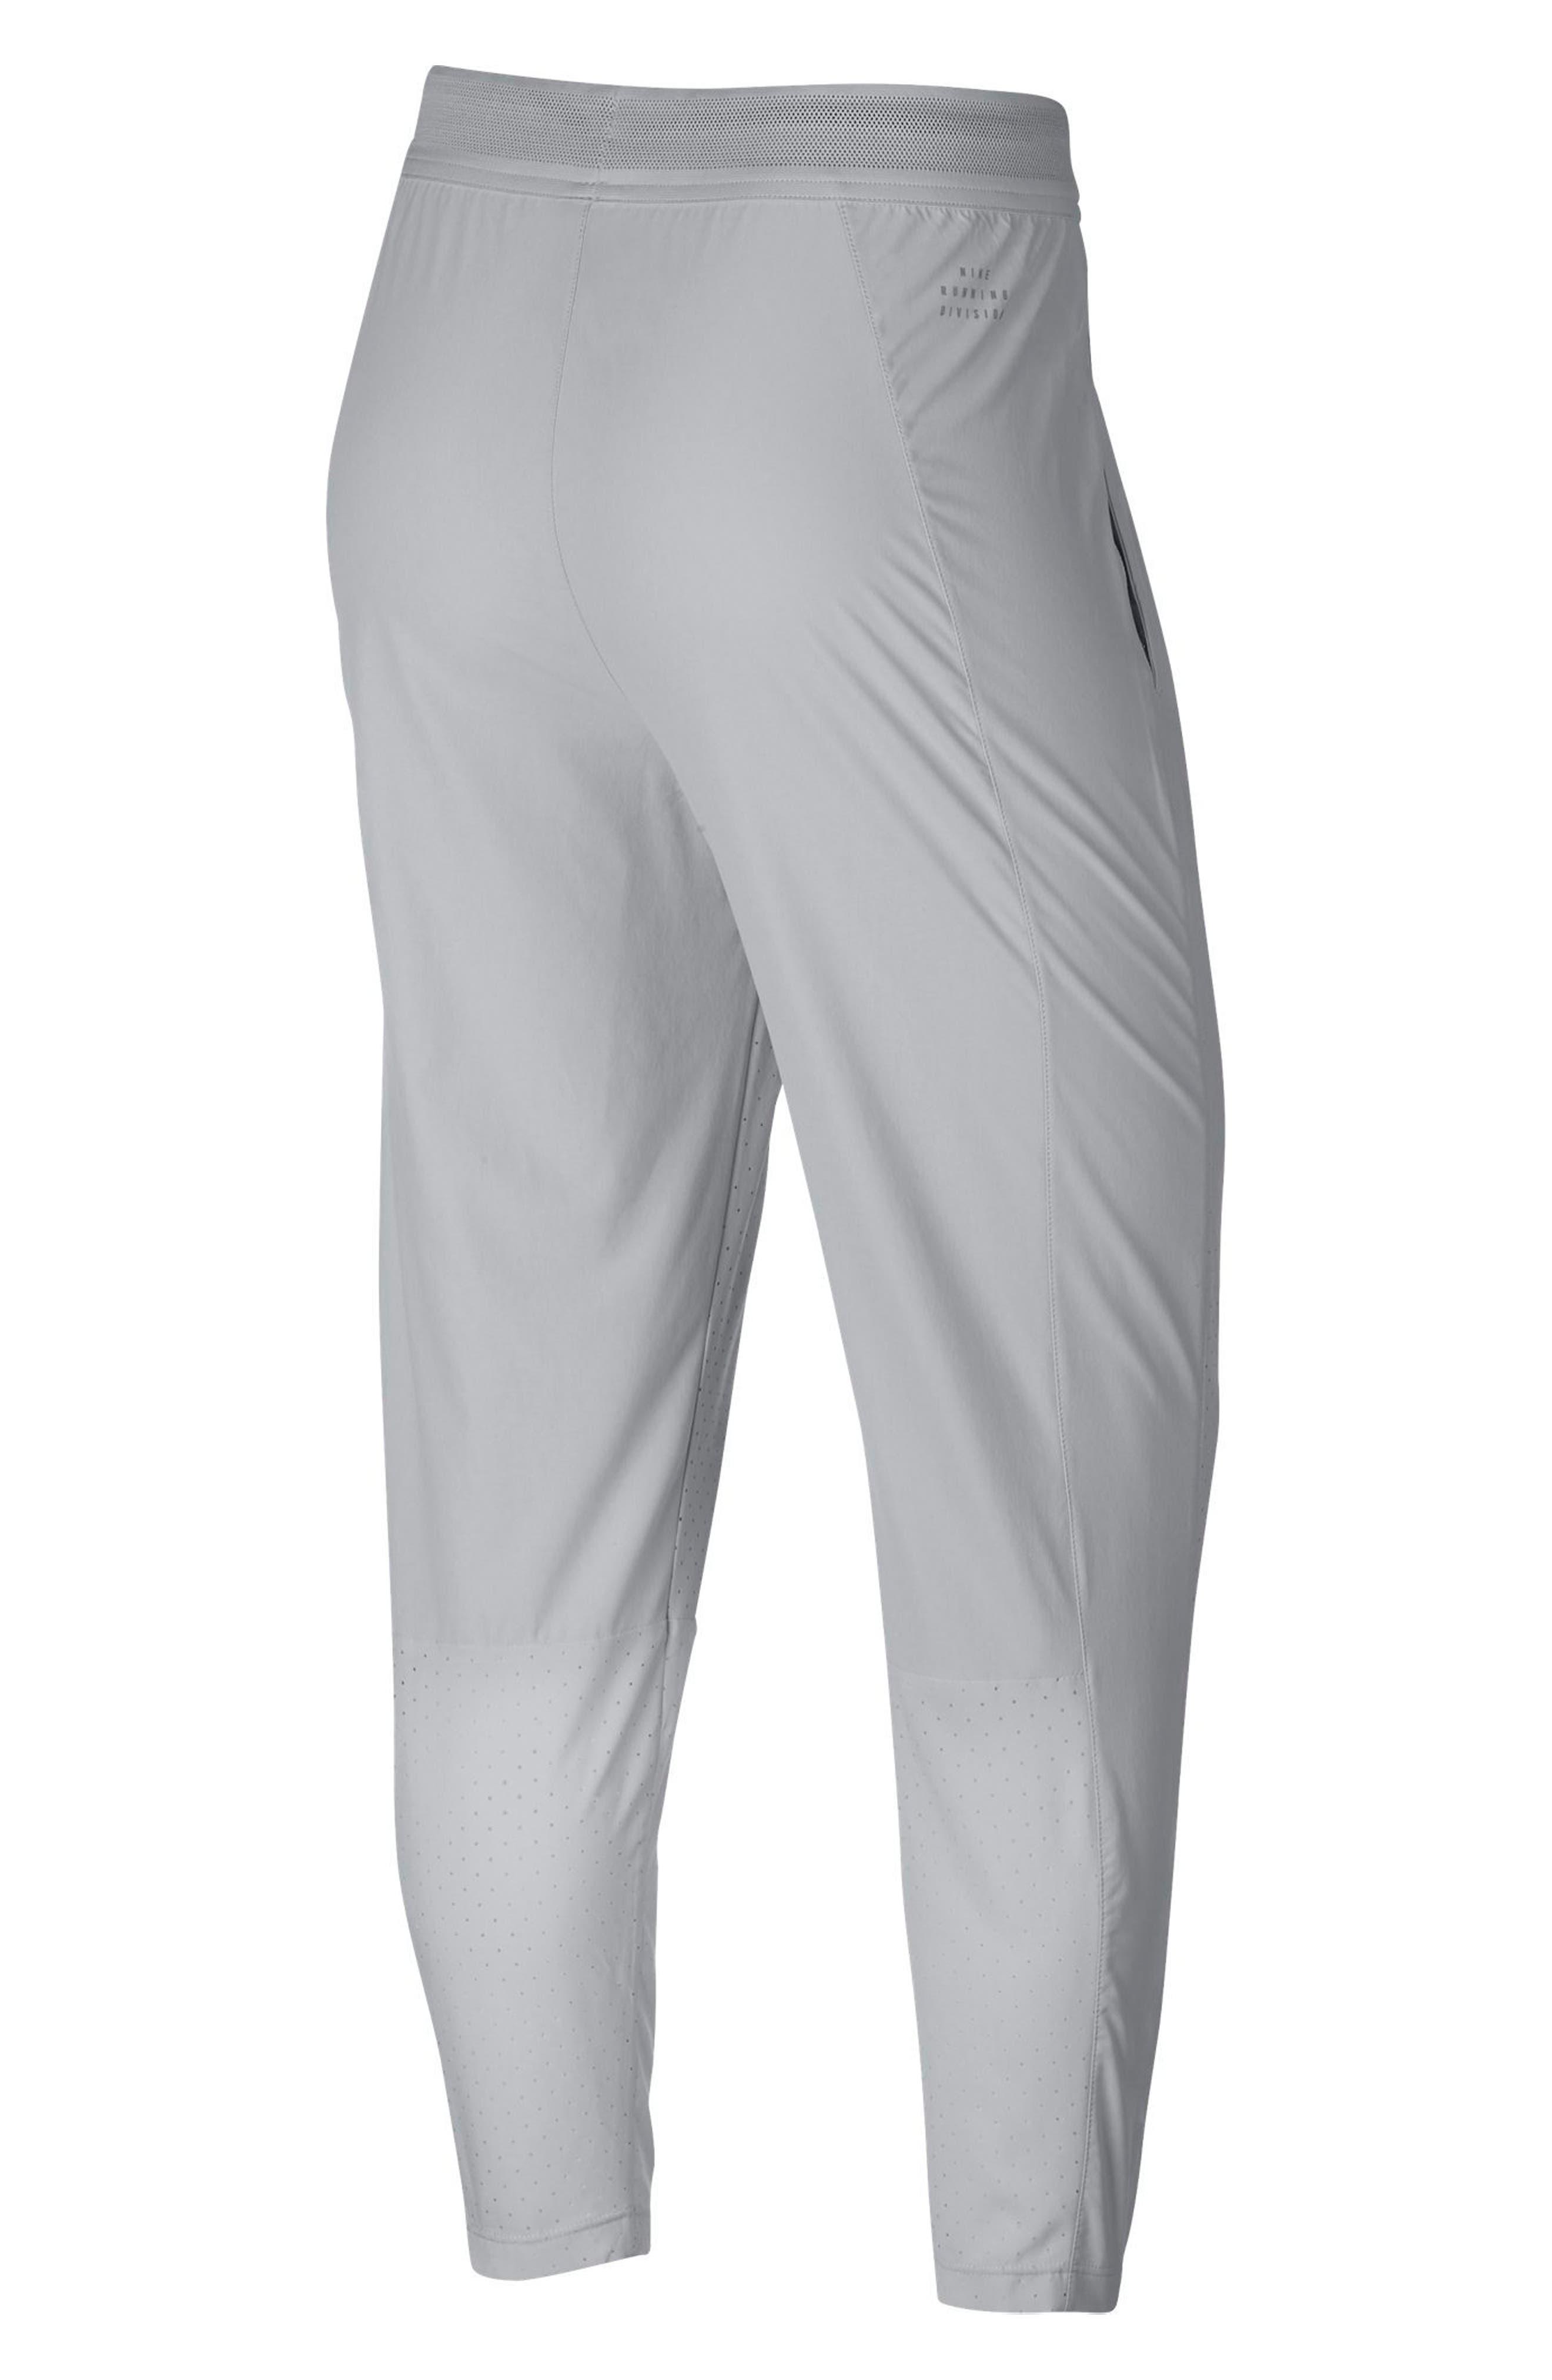 Perforated Running Pants,                             Alternate thumbnail 2, color,                             Vast Grey/ Vast Grey